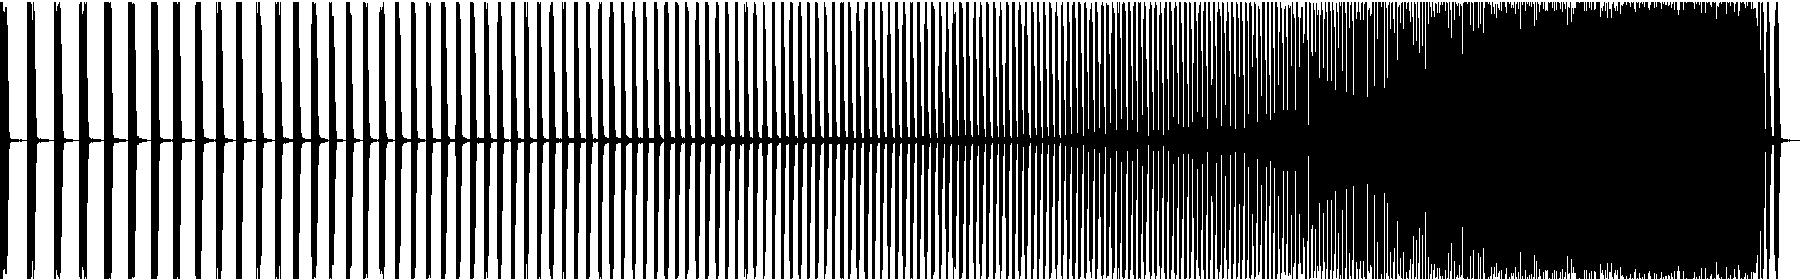 vuf1 128bpm accerlator chord 16bars c